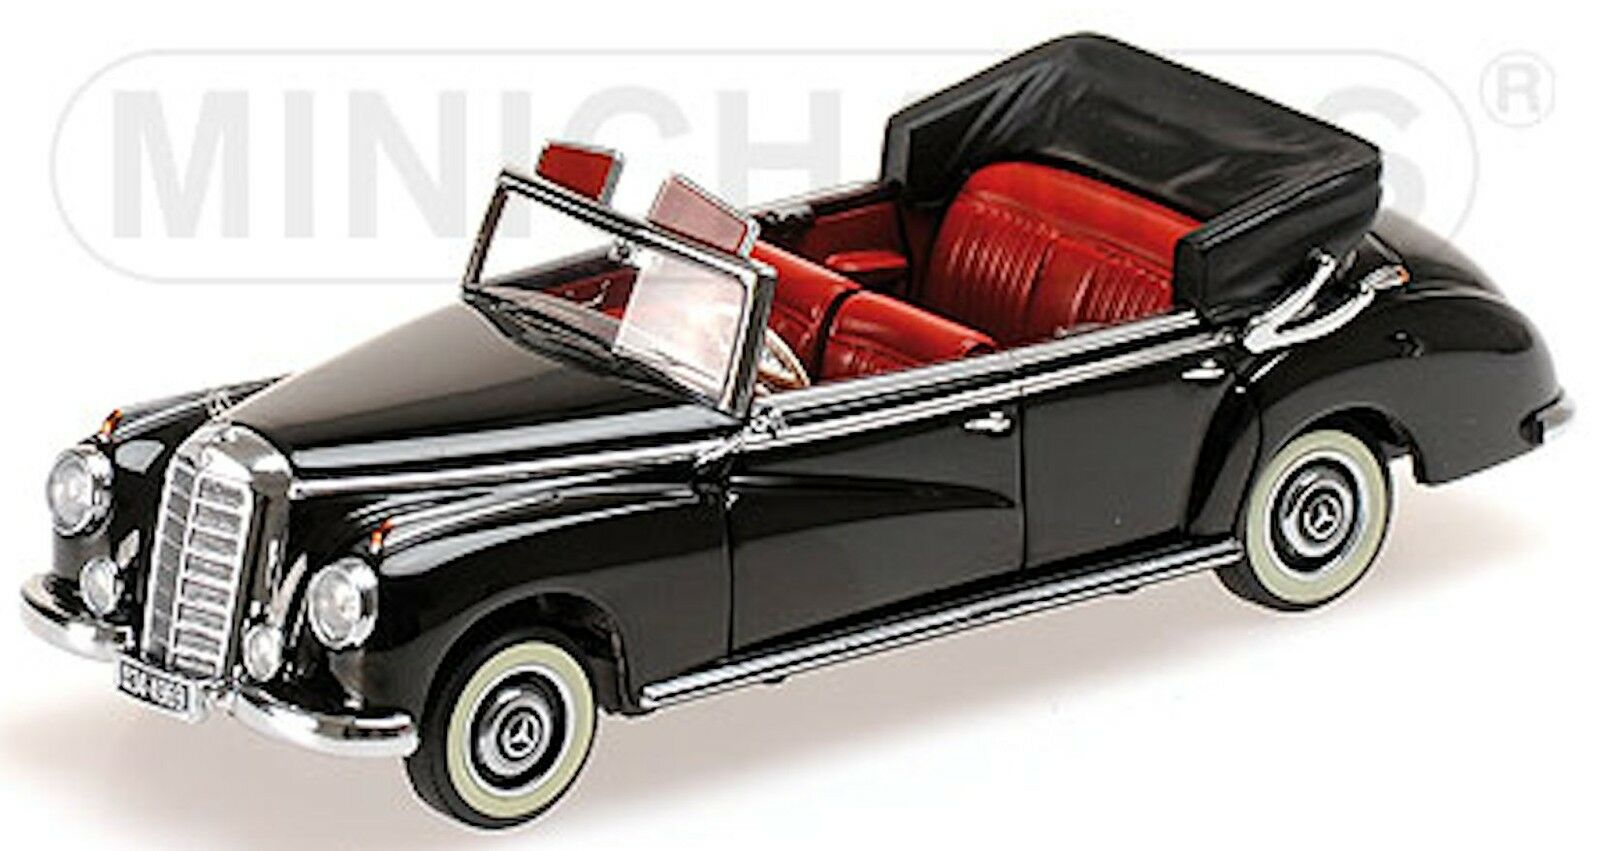 MERCEDES BENZ 300 Cabriolet W186 - 1952 - 1 43 NERO nero lim. 650 pcs